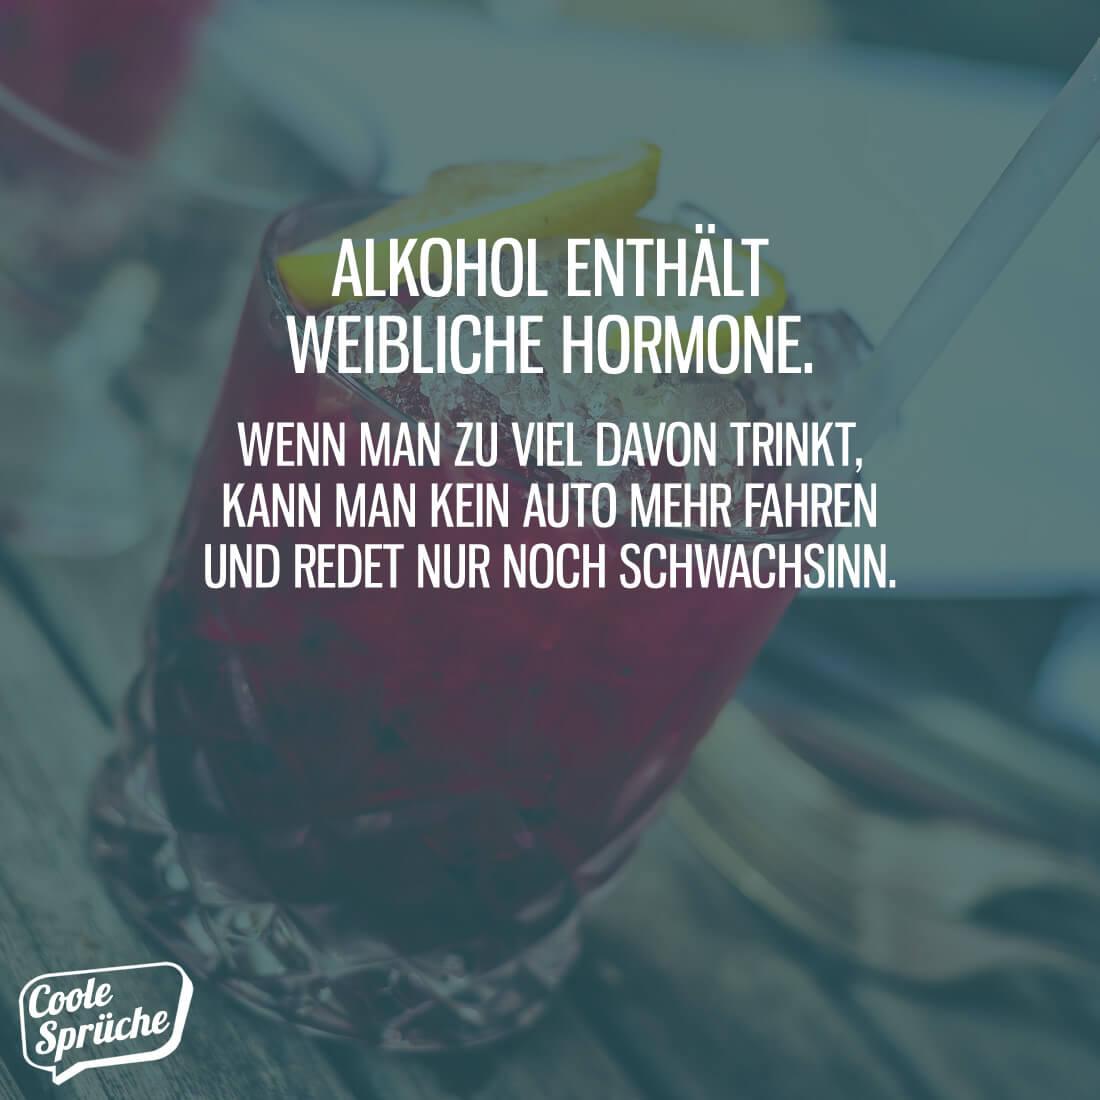 Alkohol am wochenende